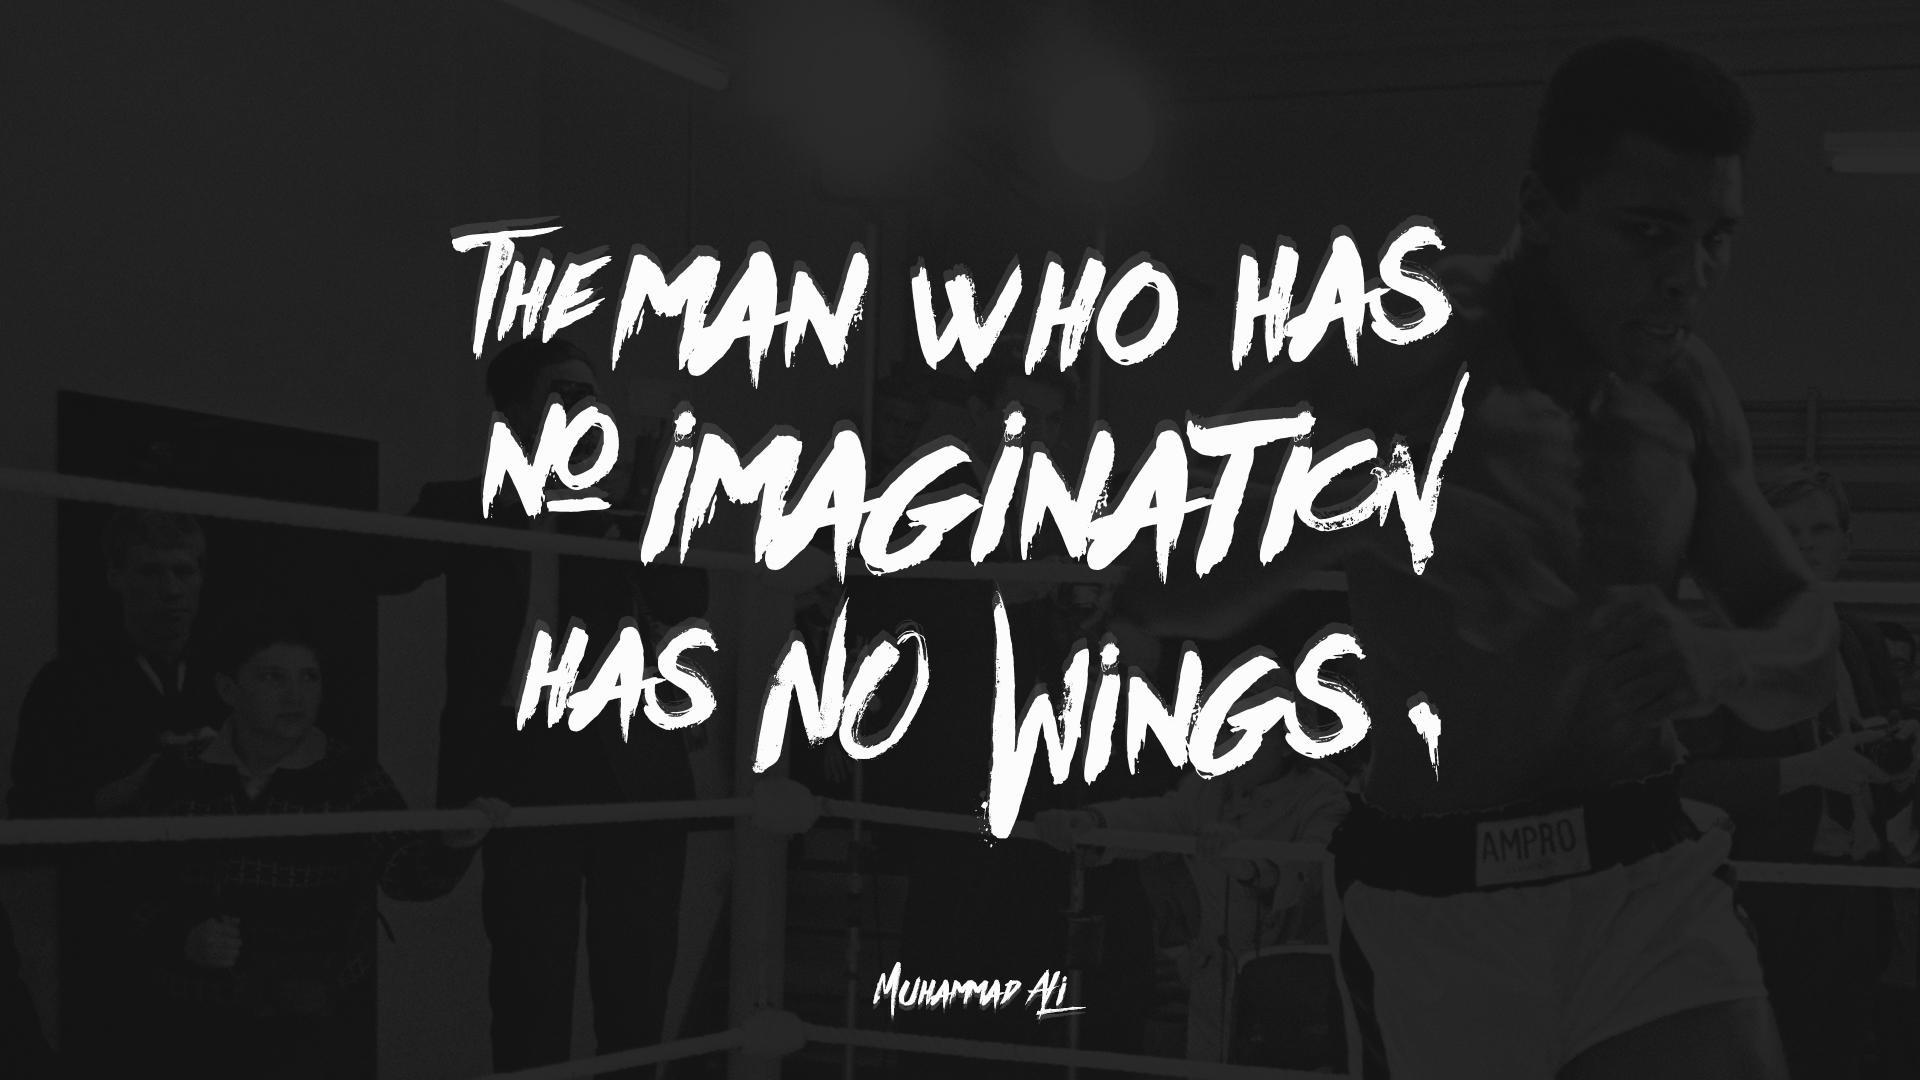 Muhammad-Ali-Quotes-HD-Images